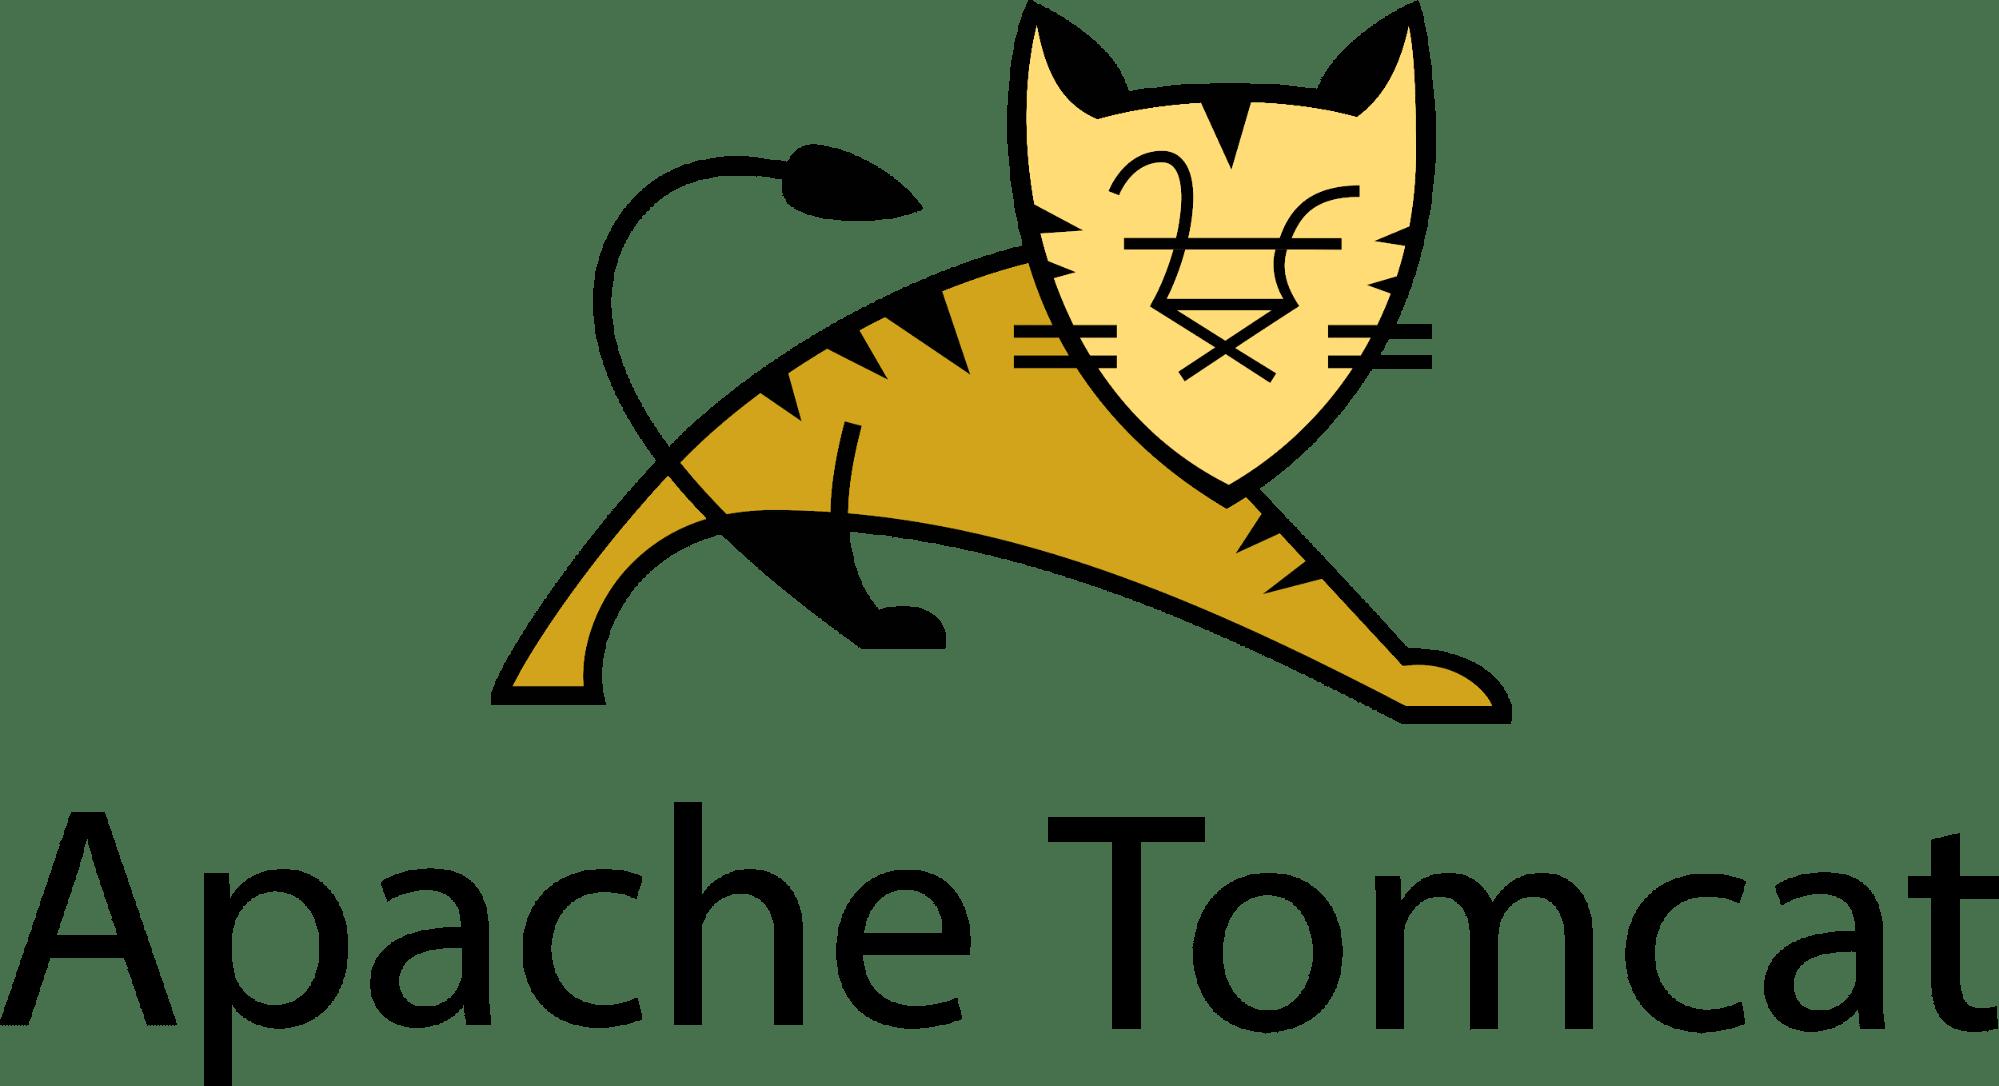 SALESmanago technologie - Apache Tomcat